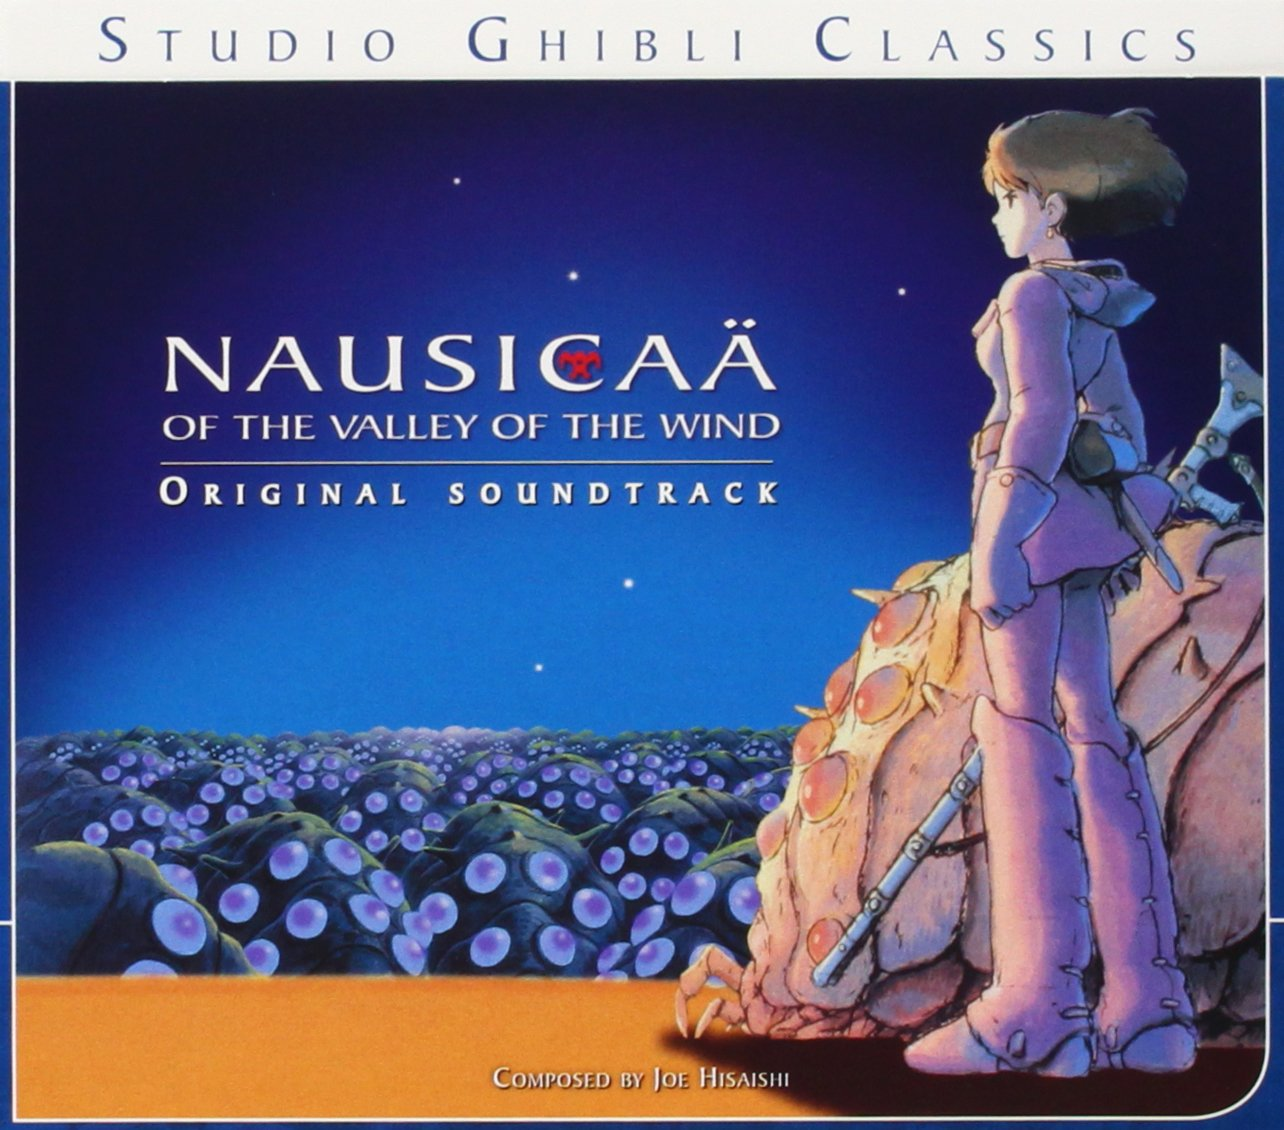 Nausicaa of the Valley of the Wind (1) Japanese original